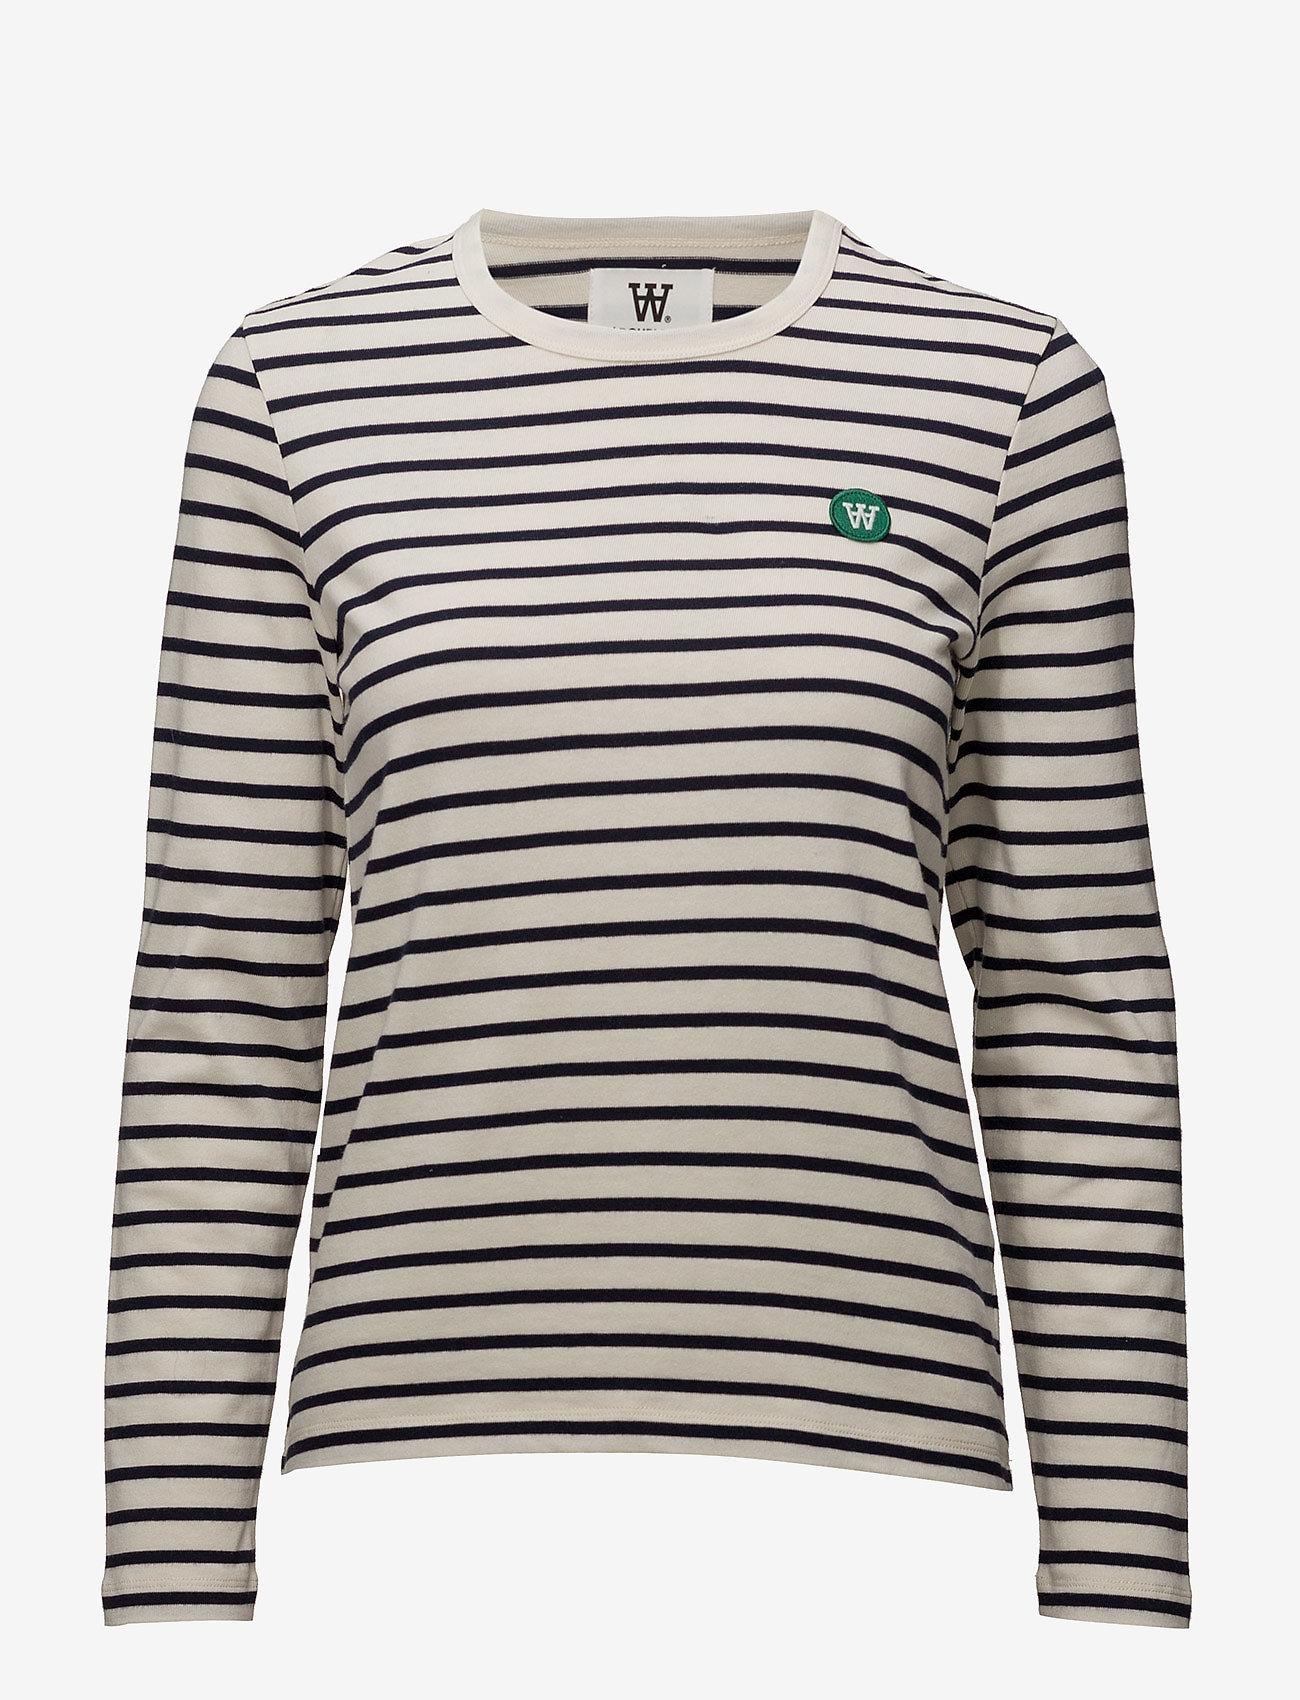 Wood Wood - Moa long sleeve - langærmede toppe - off-white/navy stripes - 0